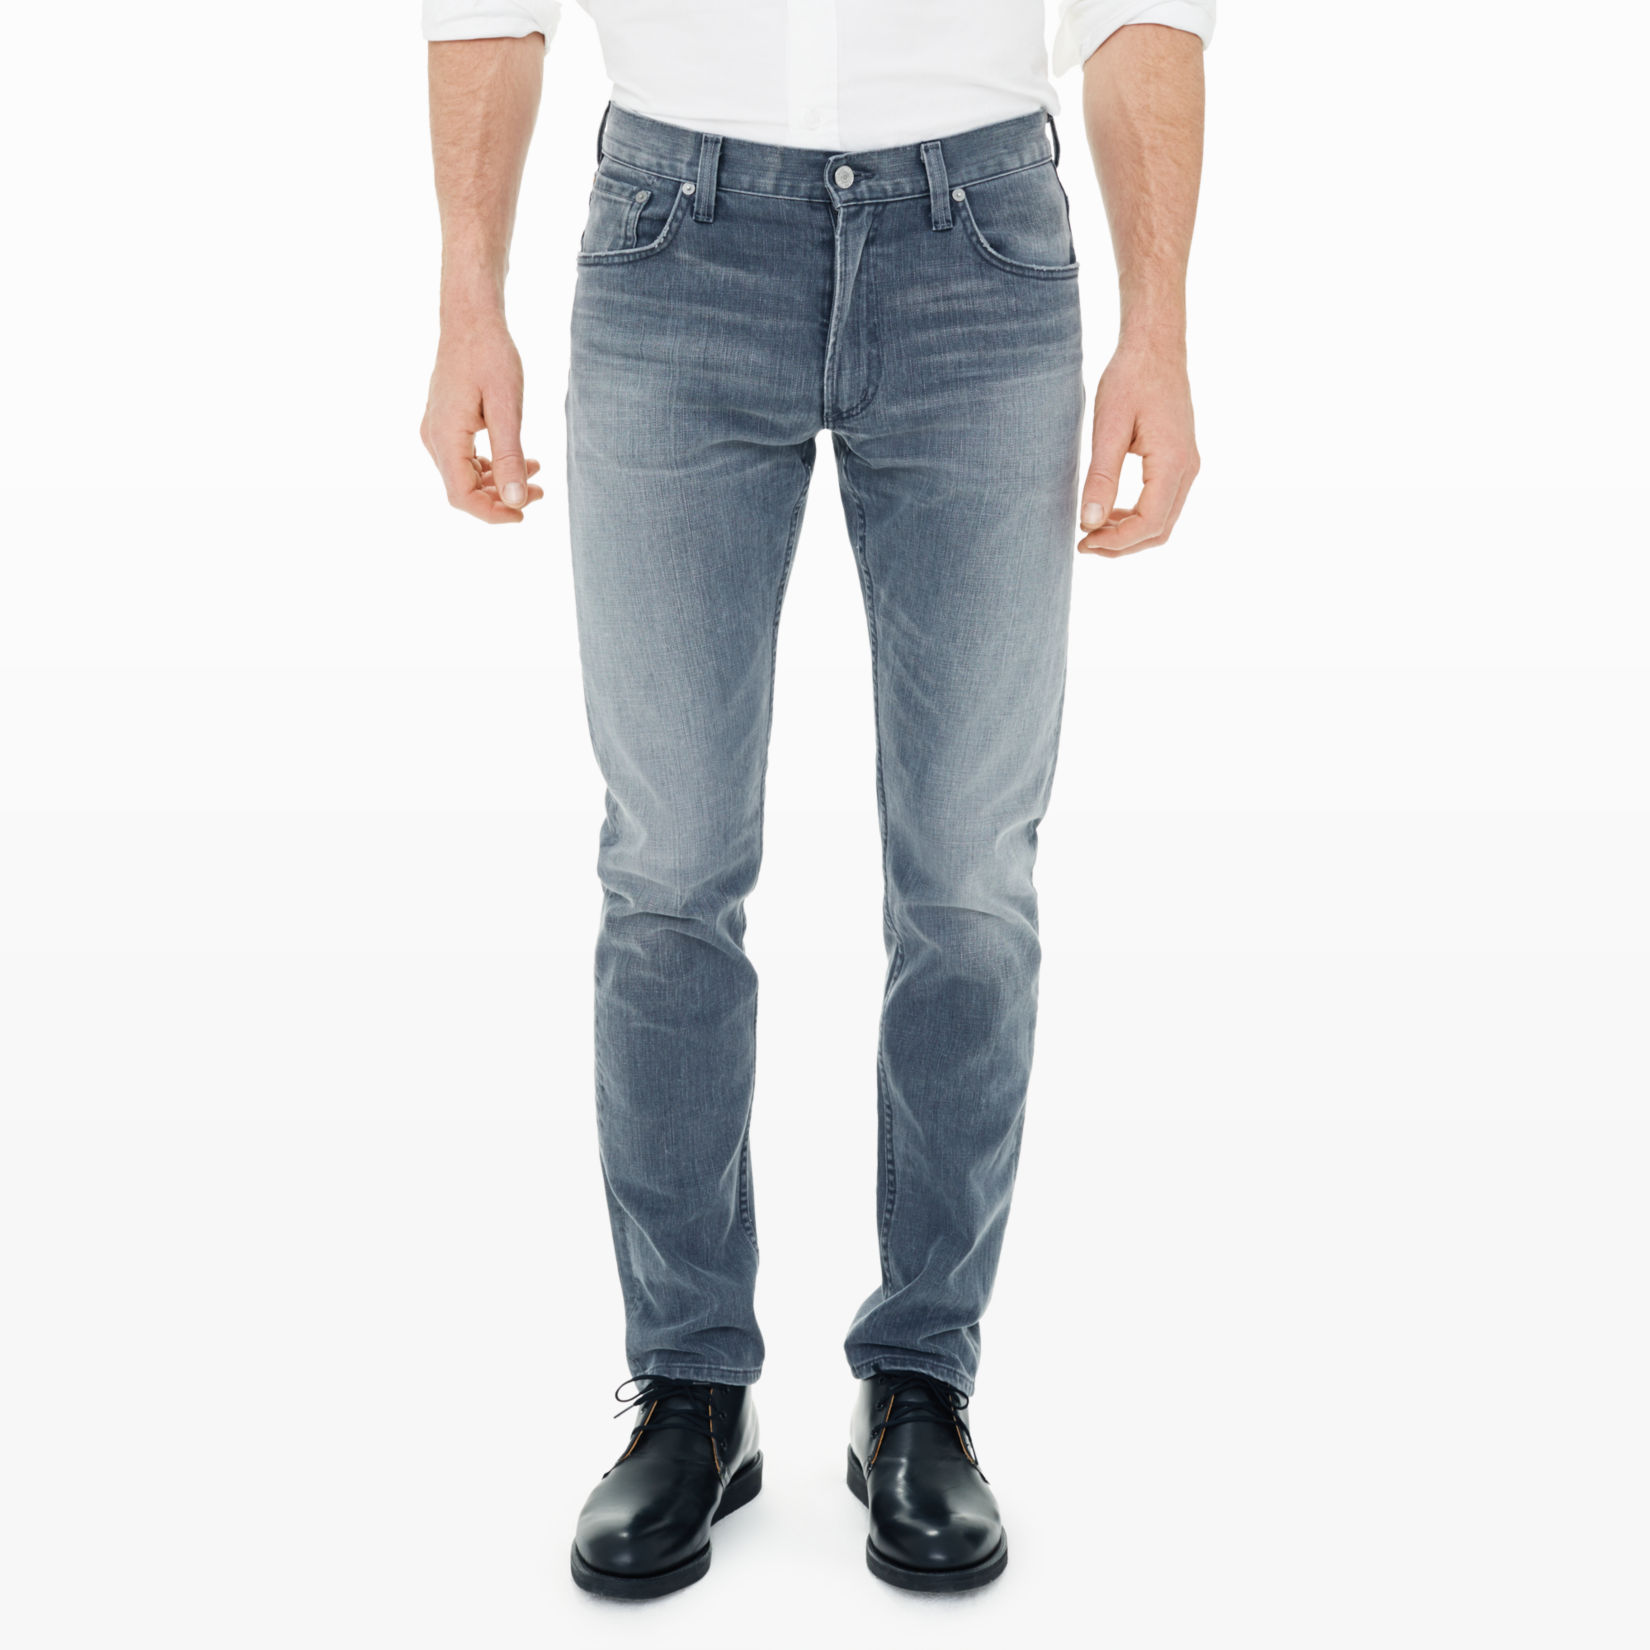 Jeans | Men/CM/Denim/Sale | Club Monaco